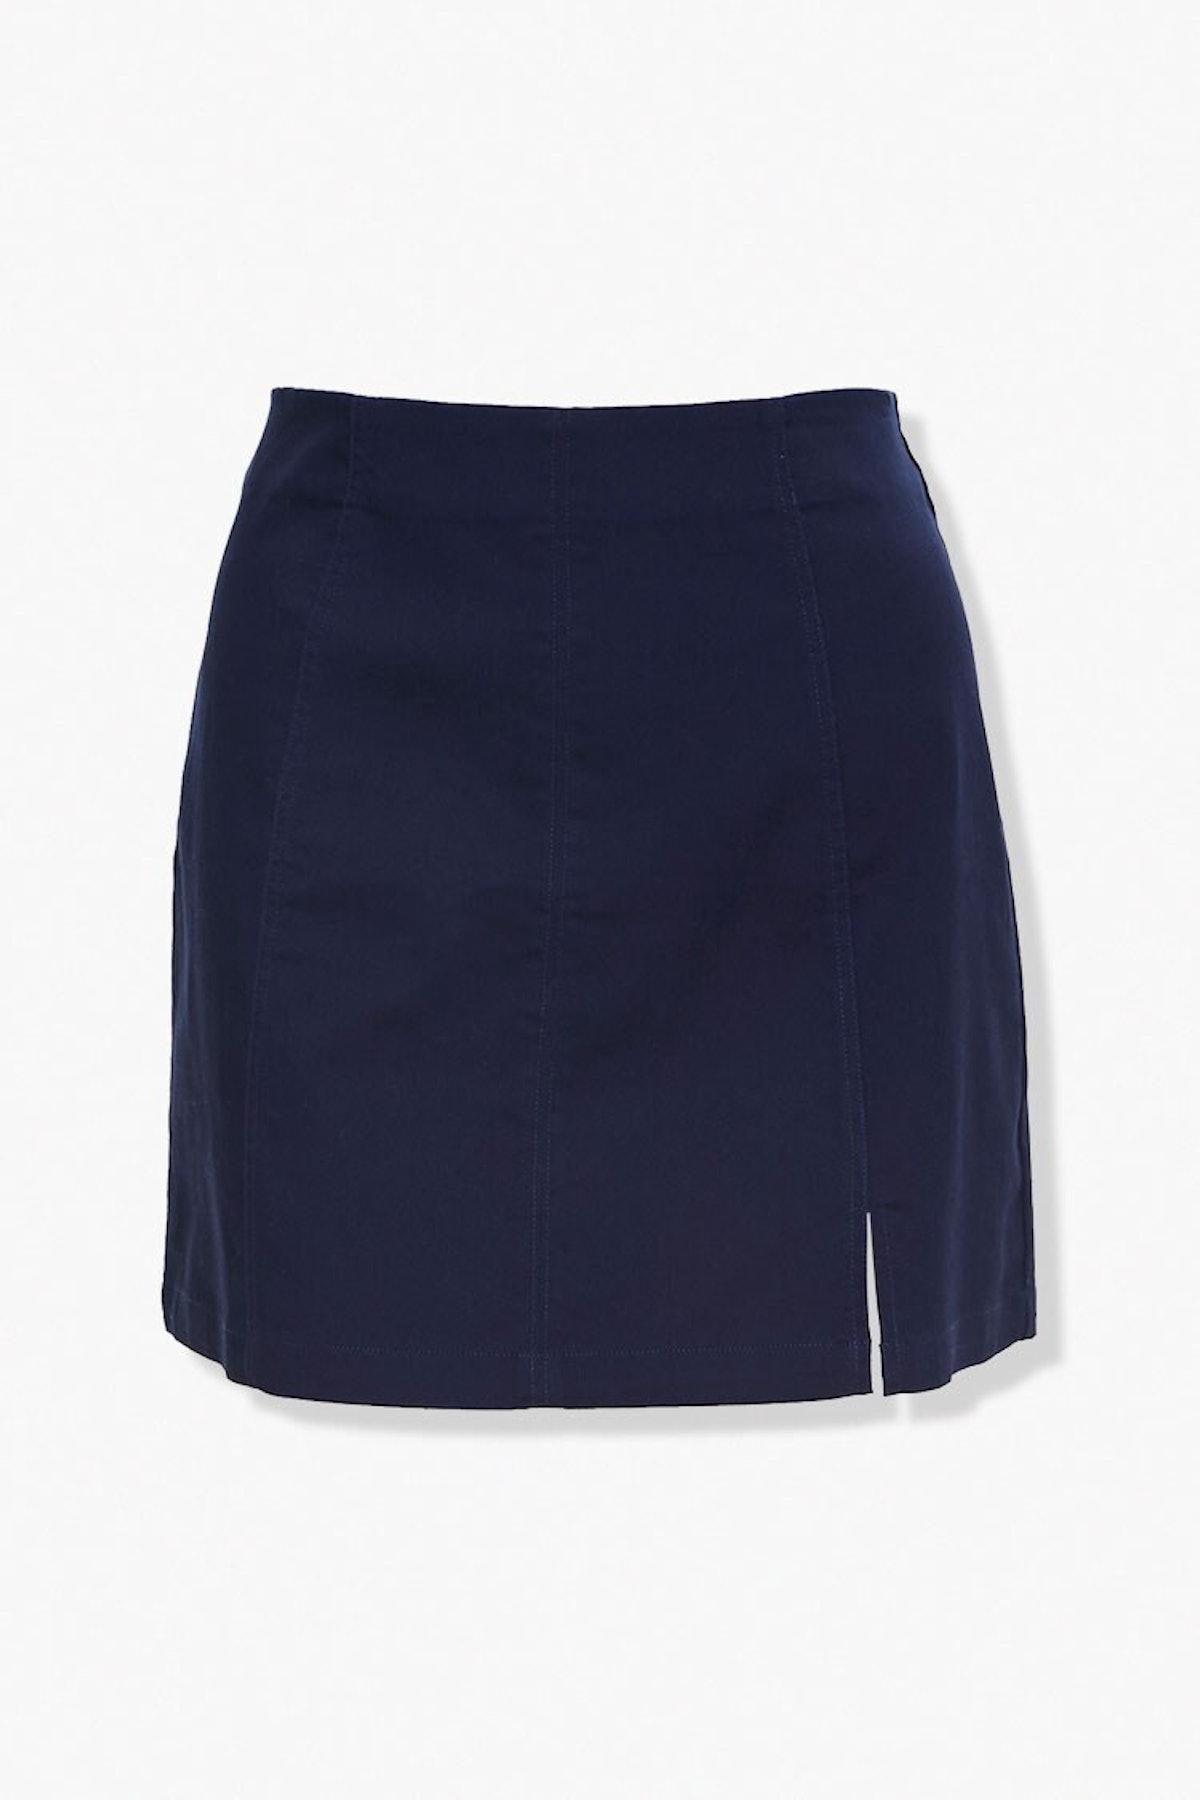 Forever 21 Plus Size Vented Mini Skirt